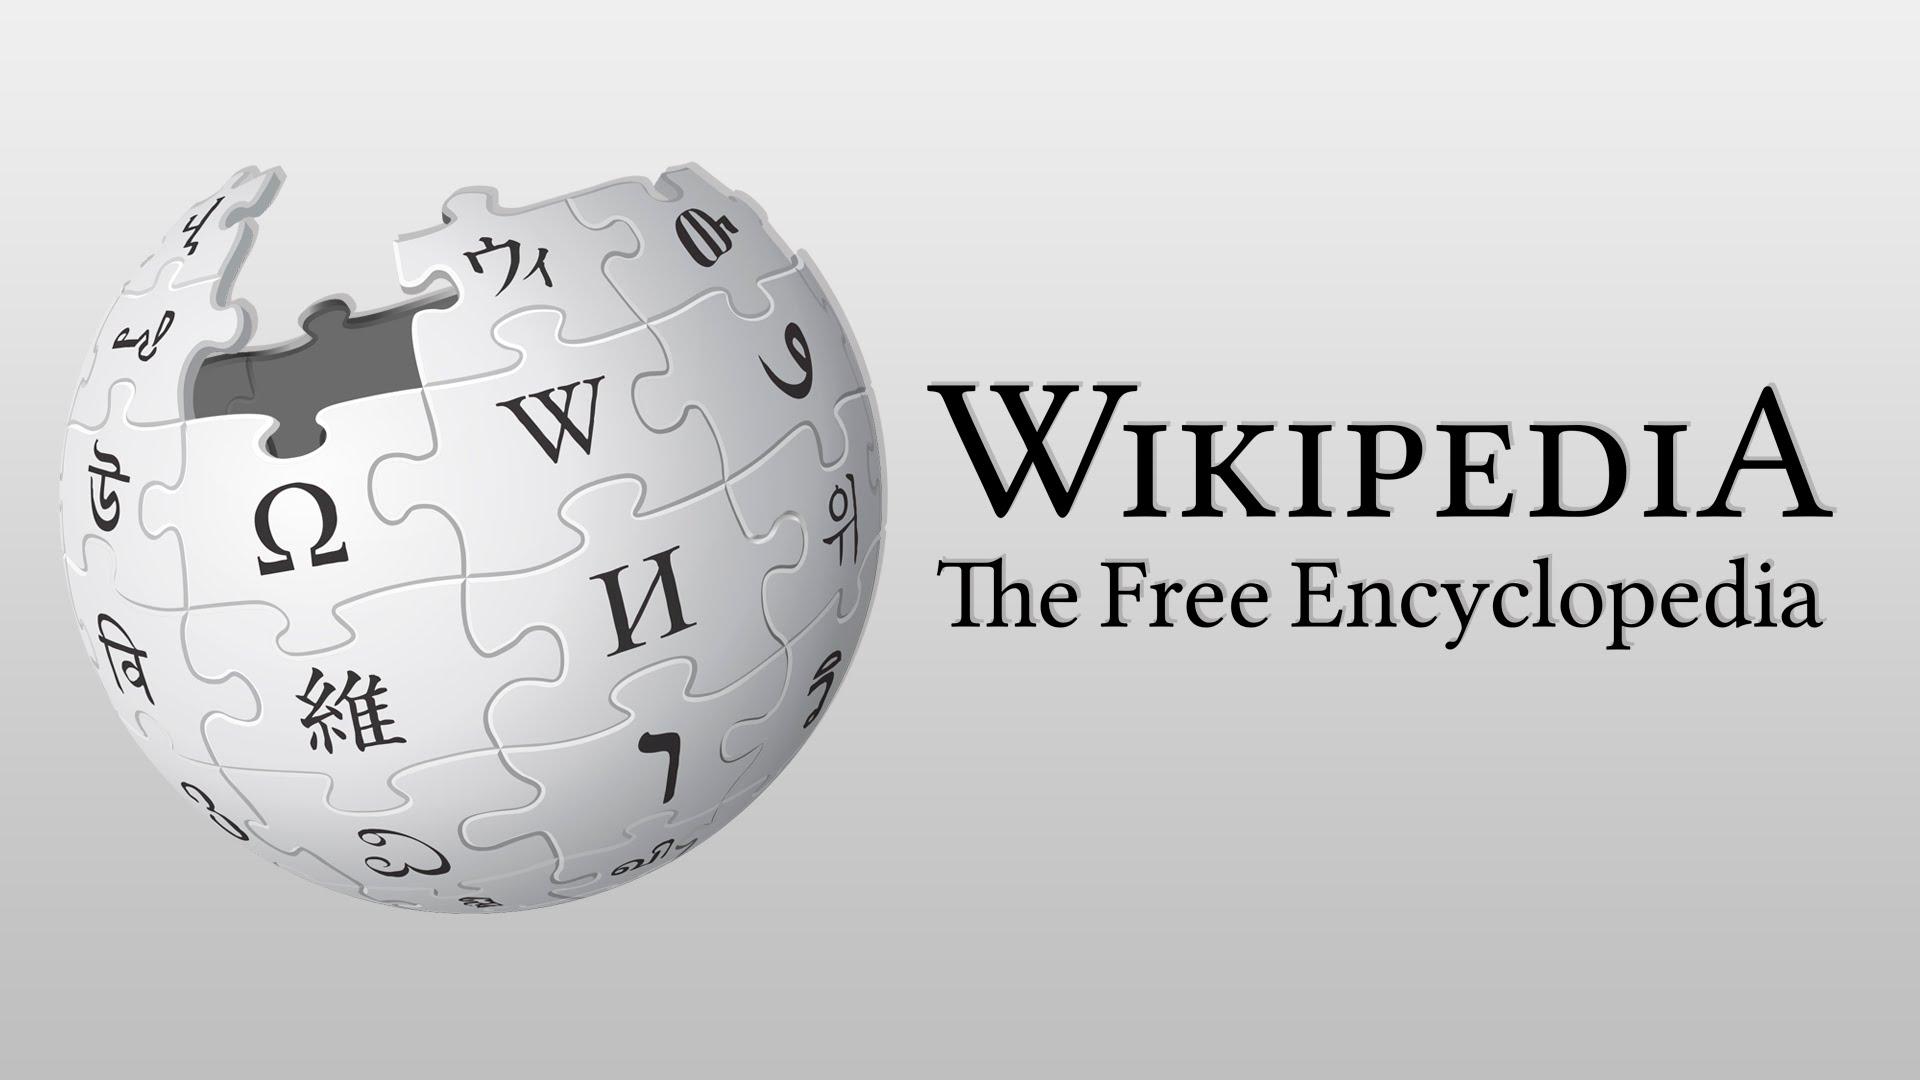 wikipedia-kya-hai-full-information-hindi